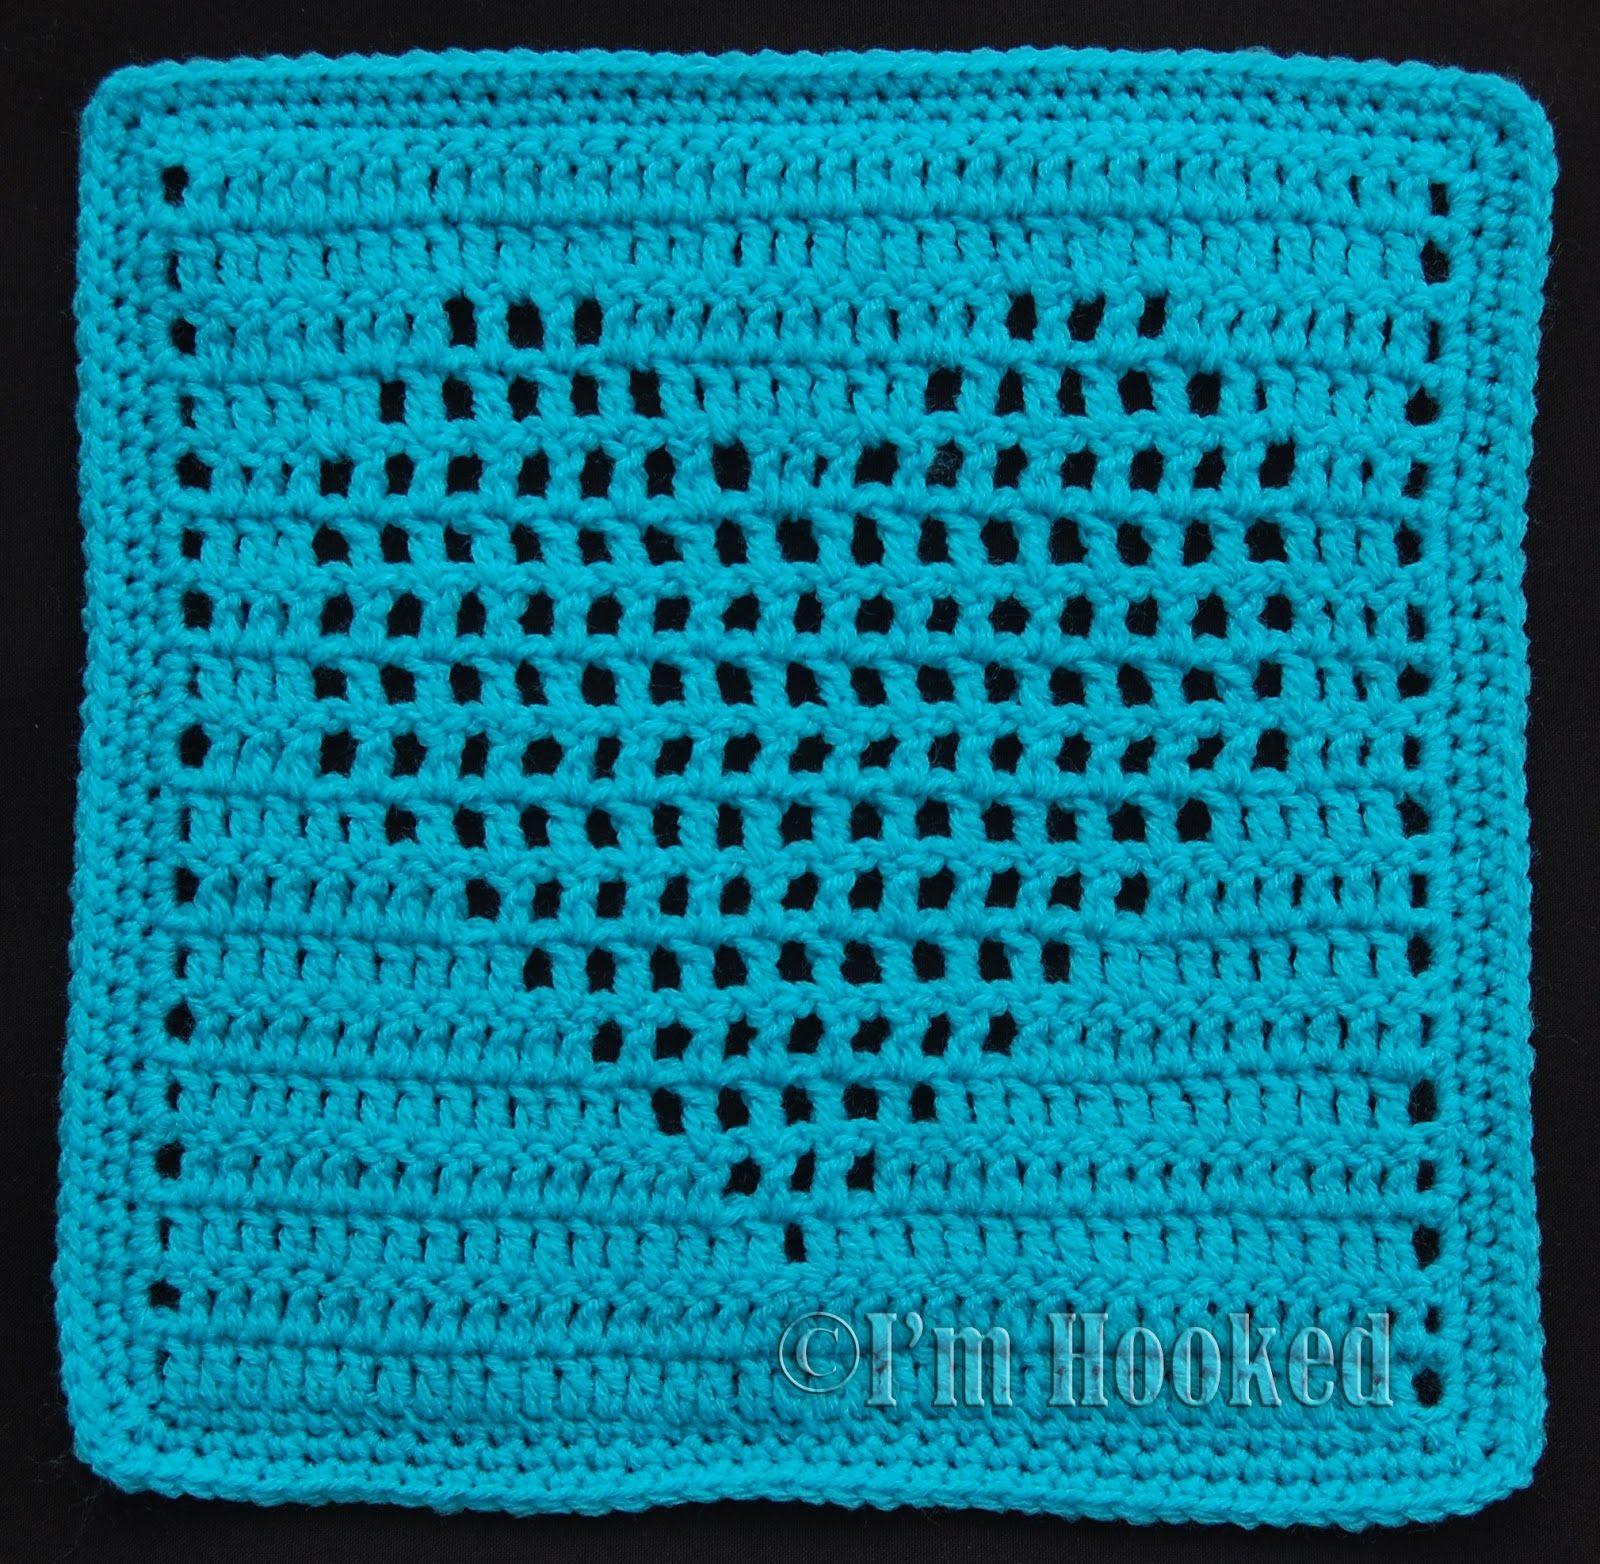 PrintFriendly.com: Print web pages, create PDFs   Crochet ...